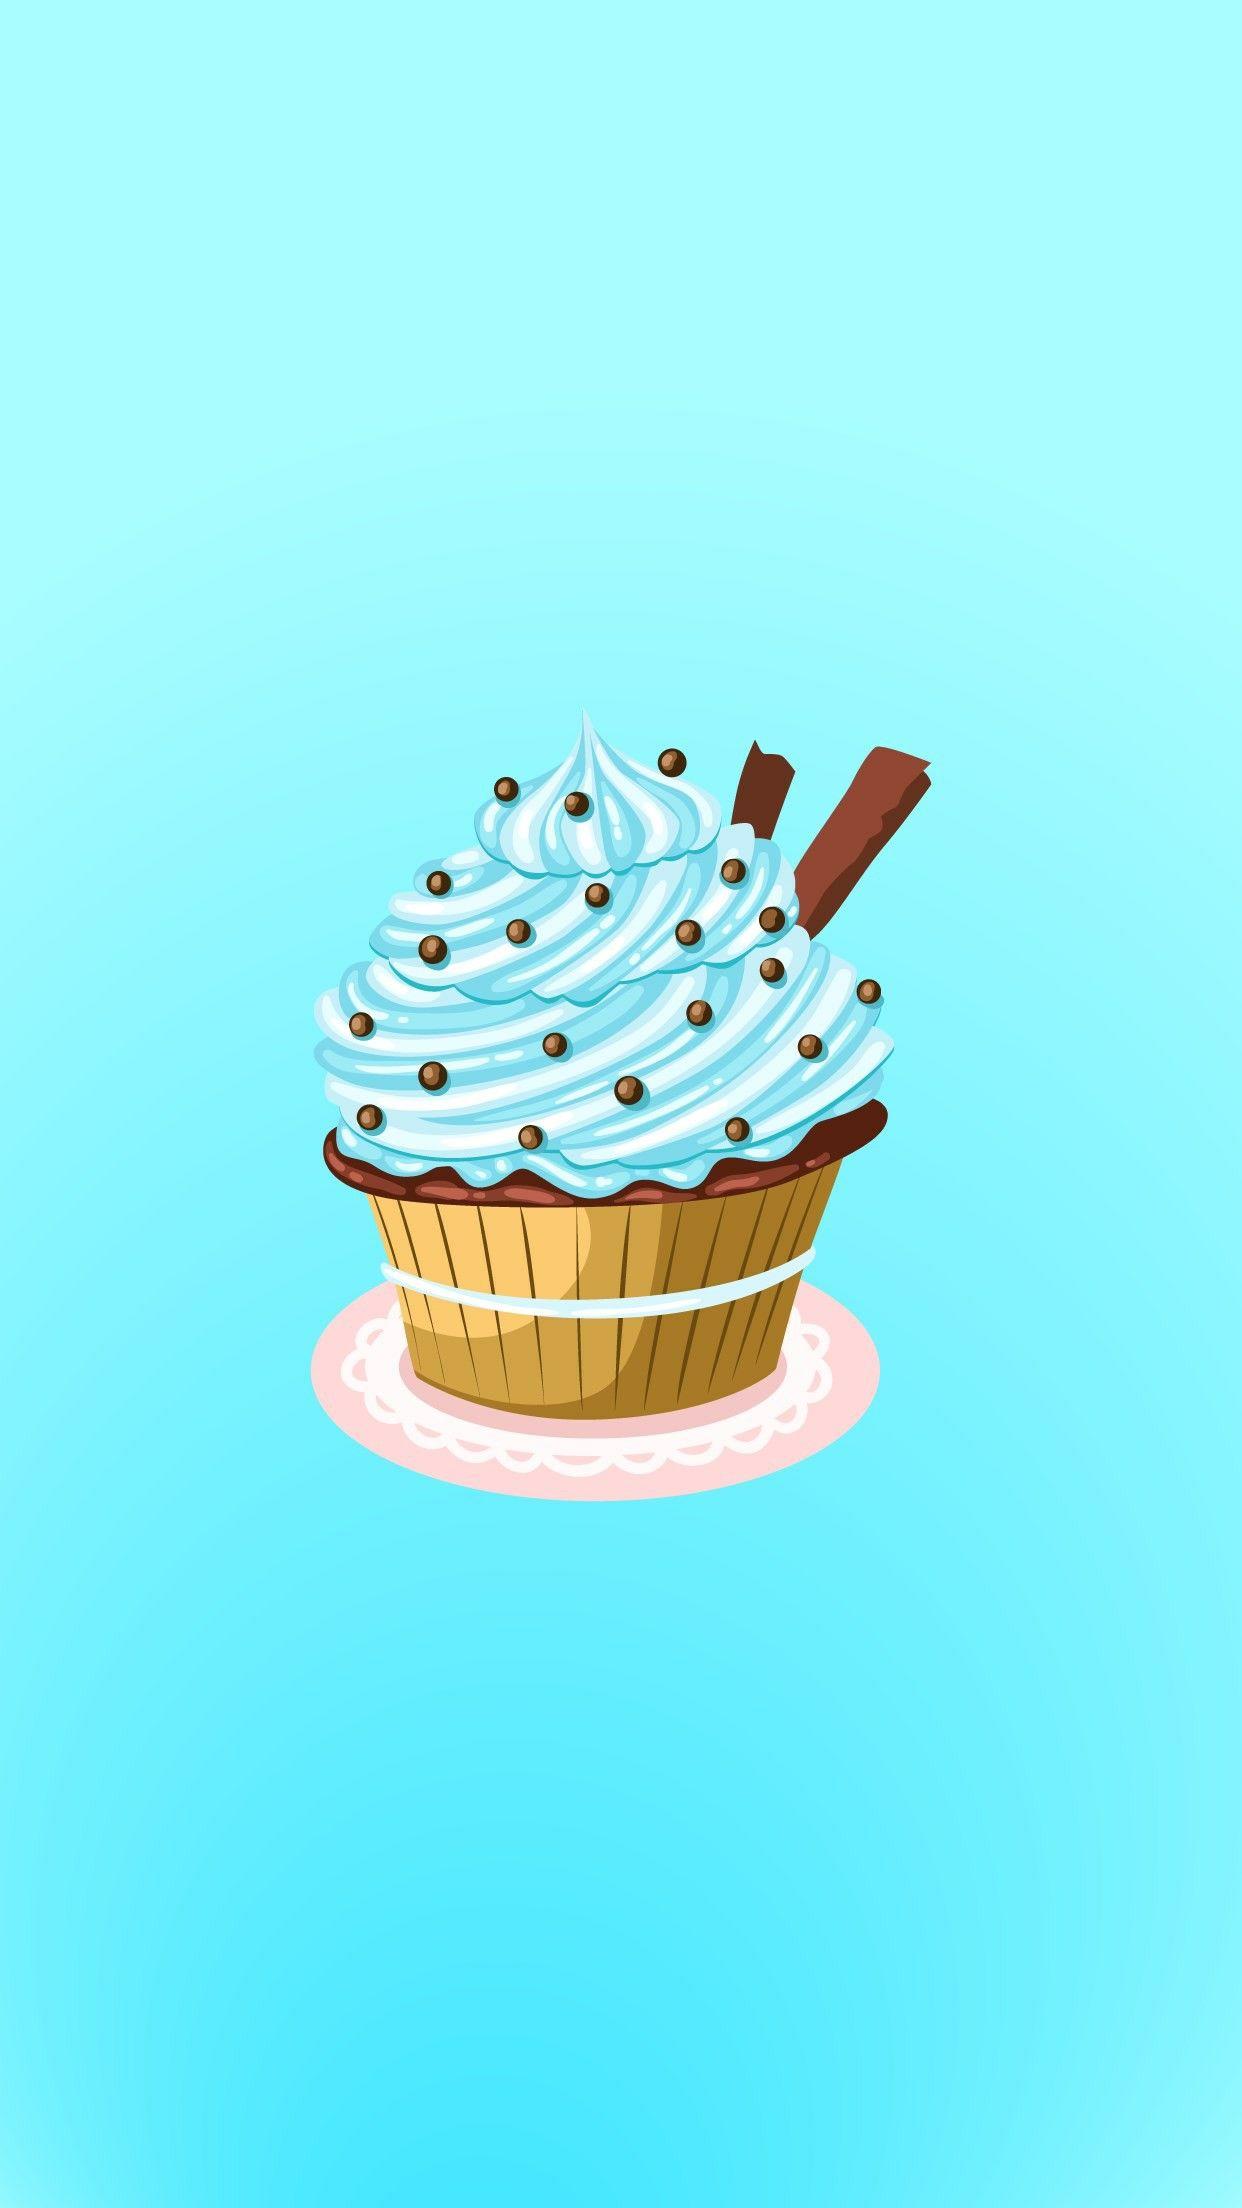 Pin By Jessika Villalobos On Cute Cupcakes Cupcakes Wallpaper Cute Cupcakes Food Puns